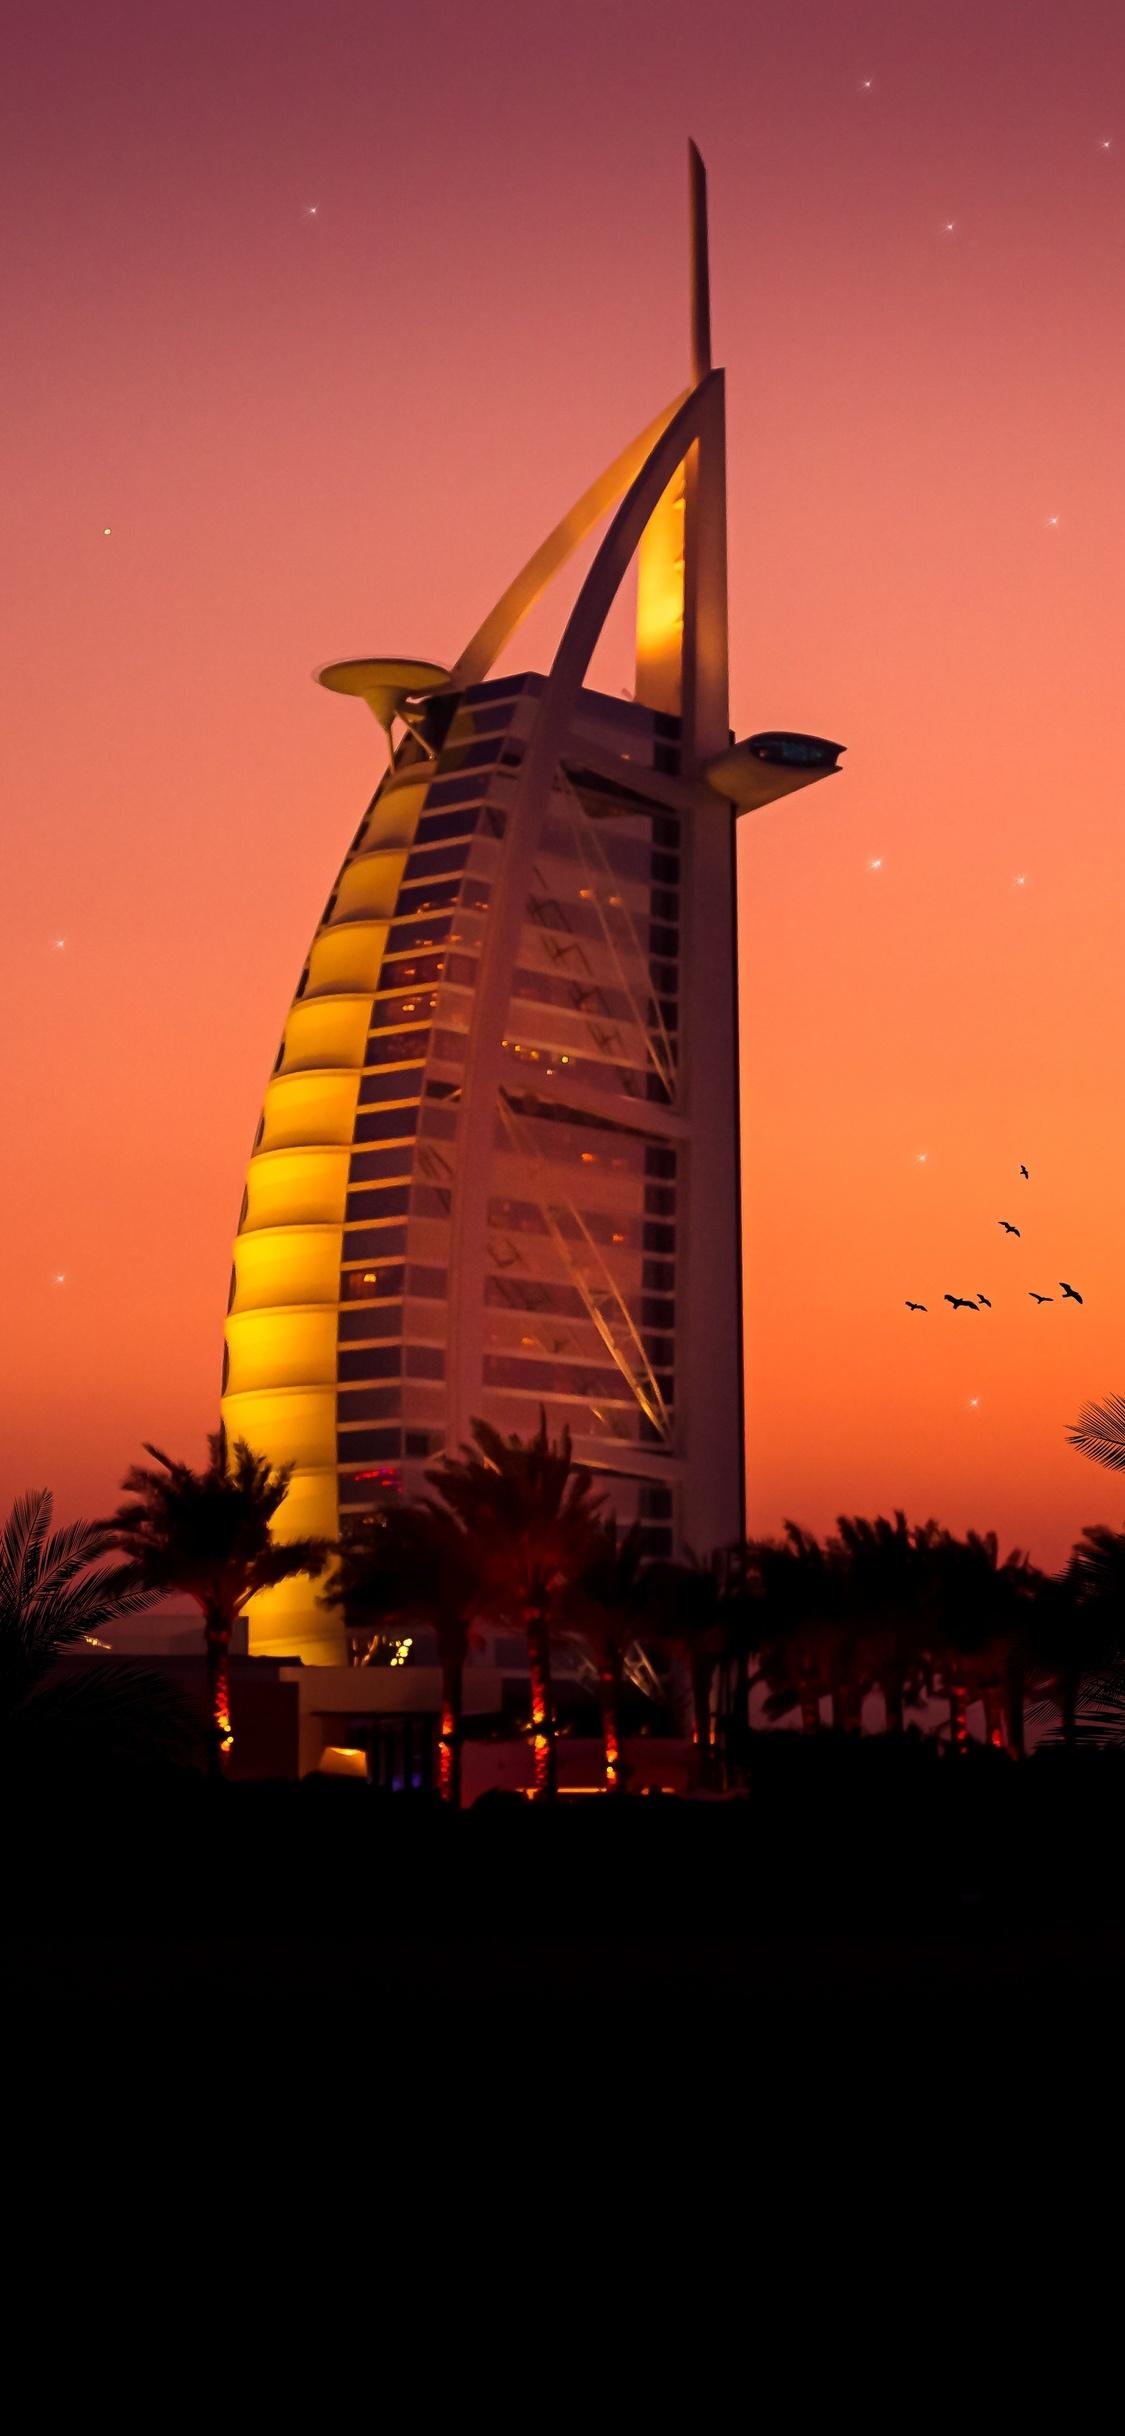 1125x2436 Burj Al Arab Iphone Xs Iphone 10 Iphone X Hd 4k